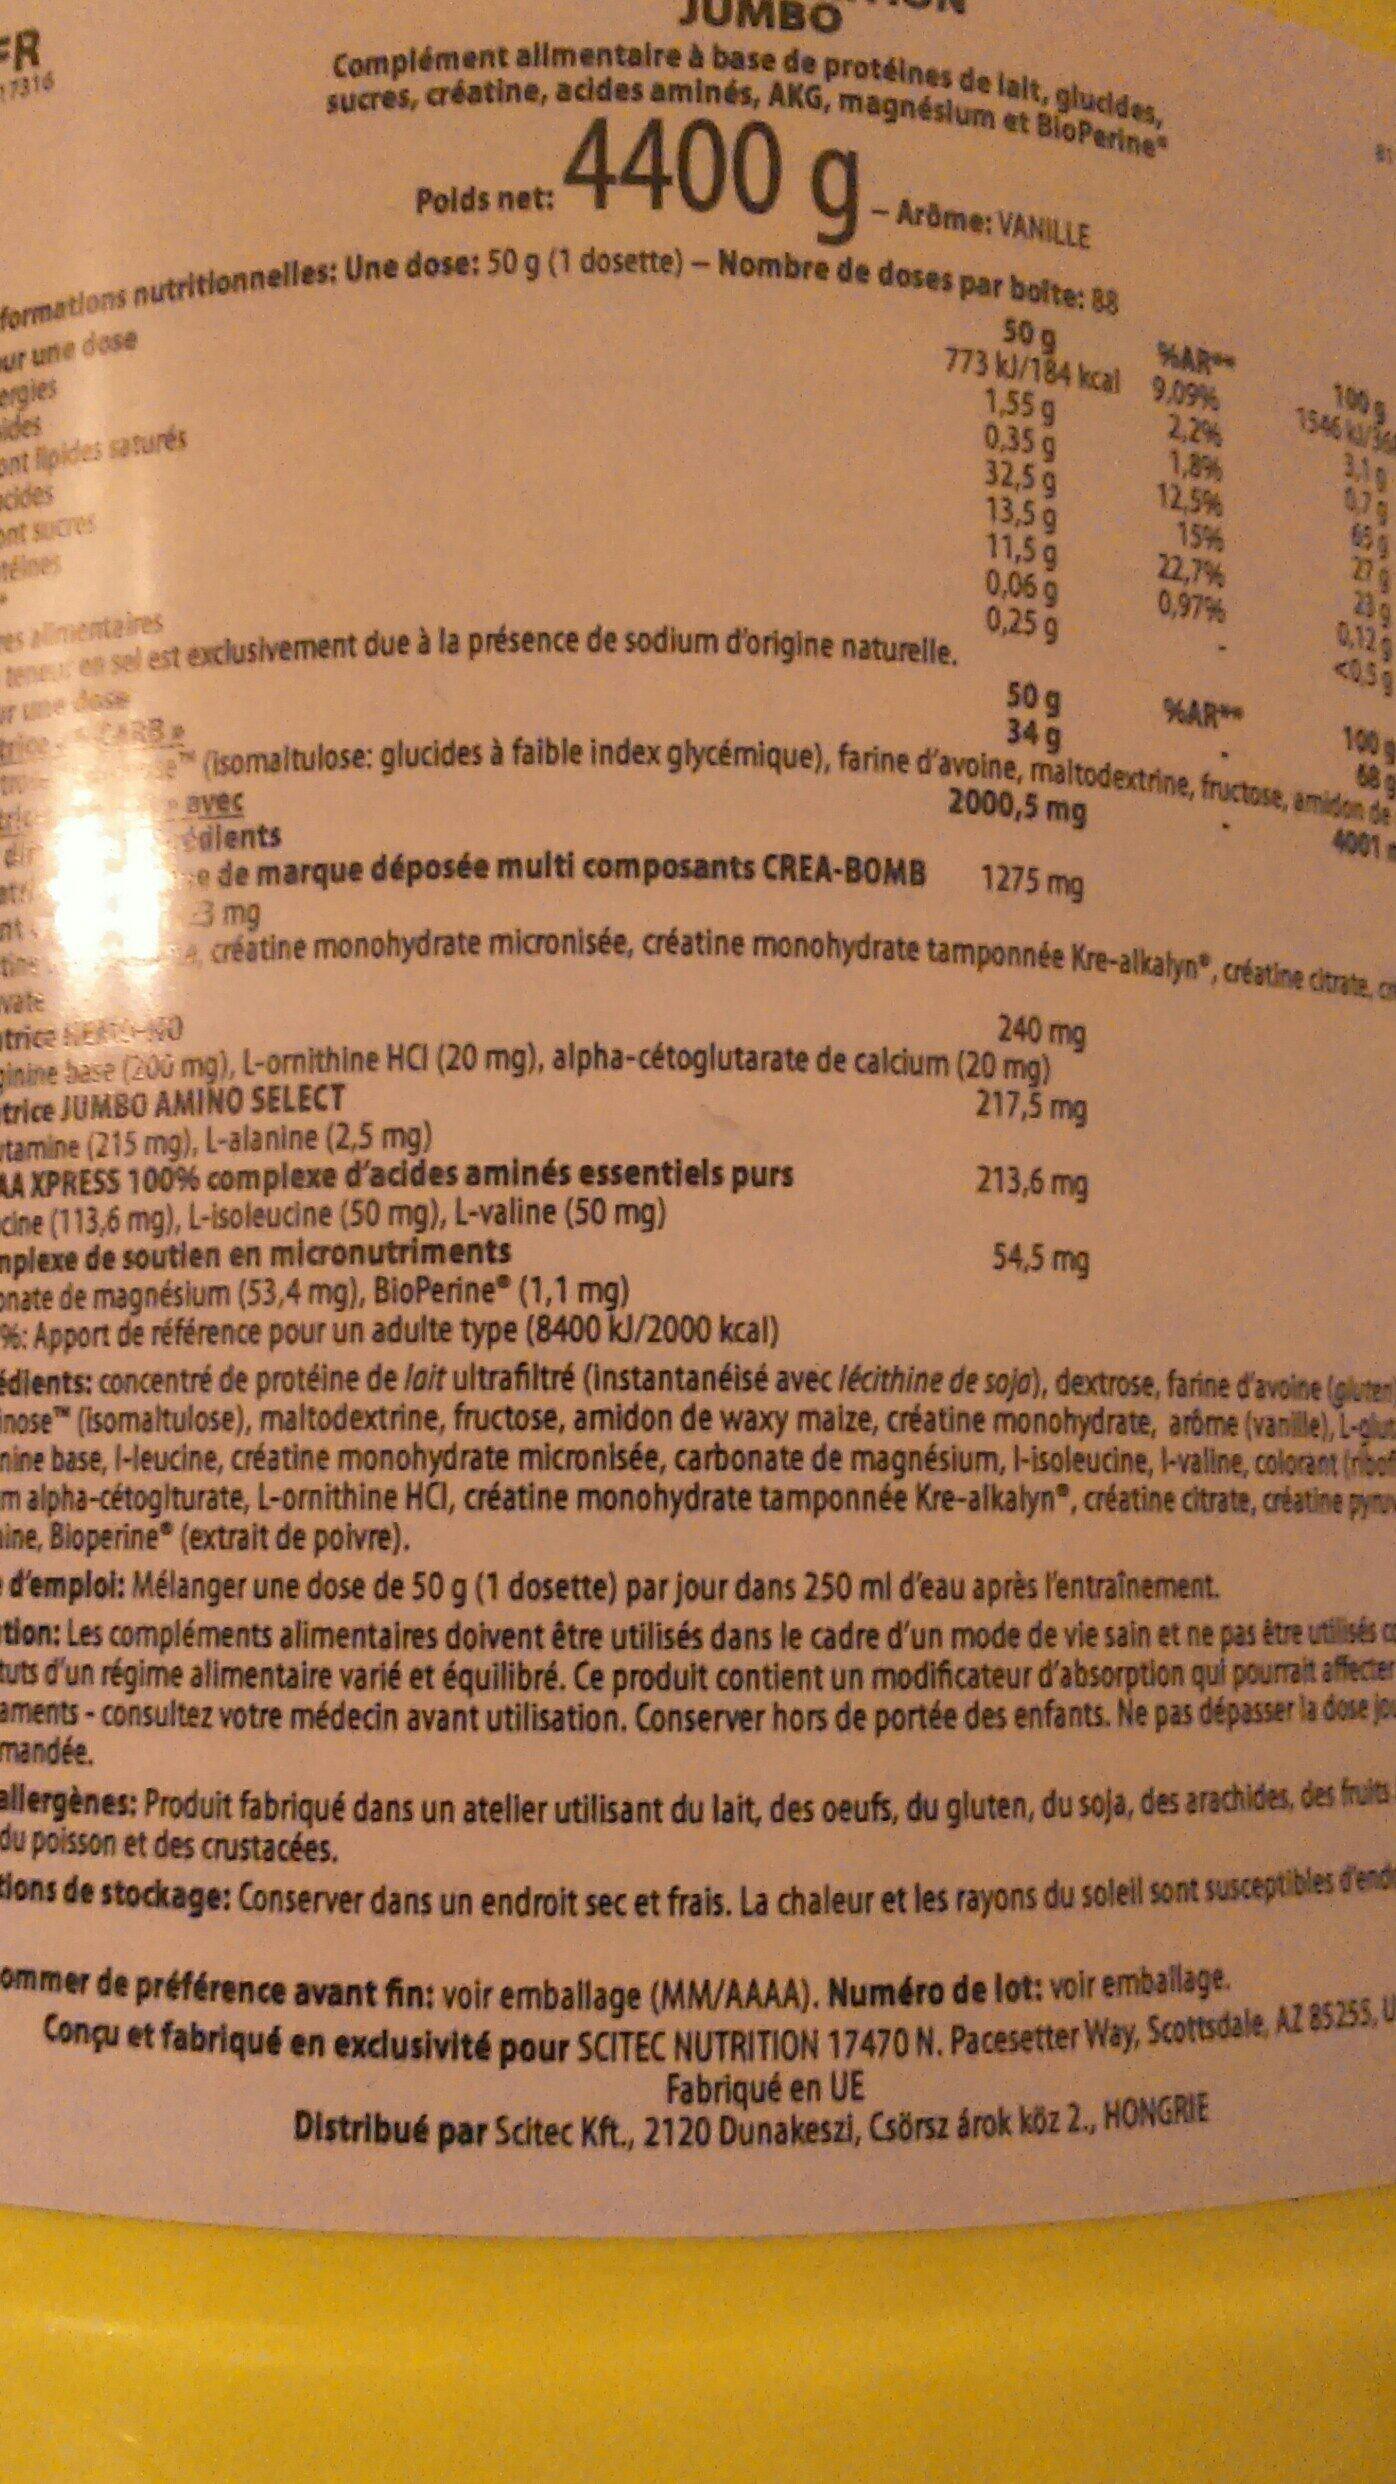 Sctec Nutrition Jumbo 4400 Gr Vanilla - Ingredients